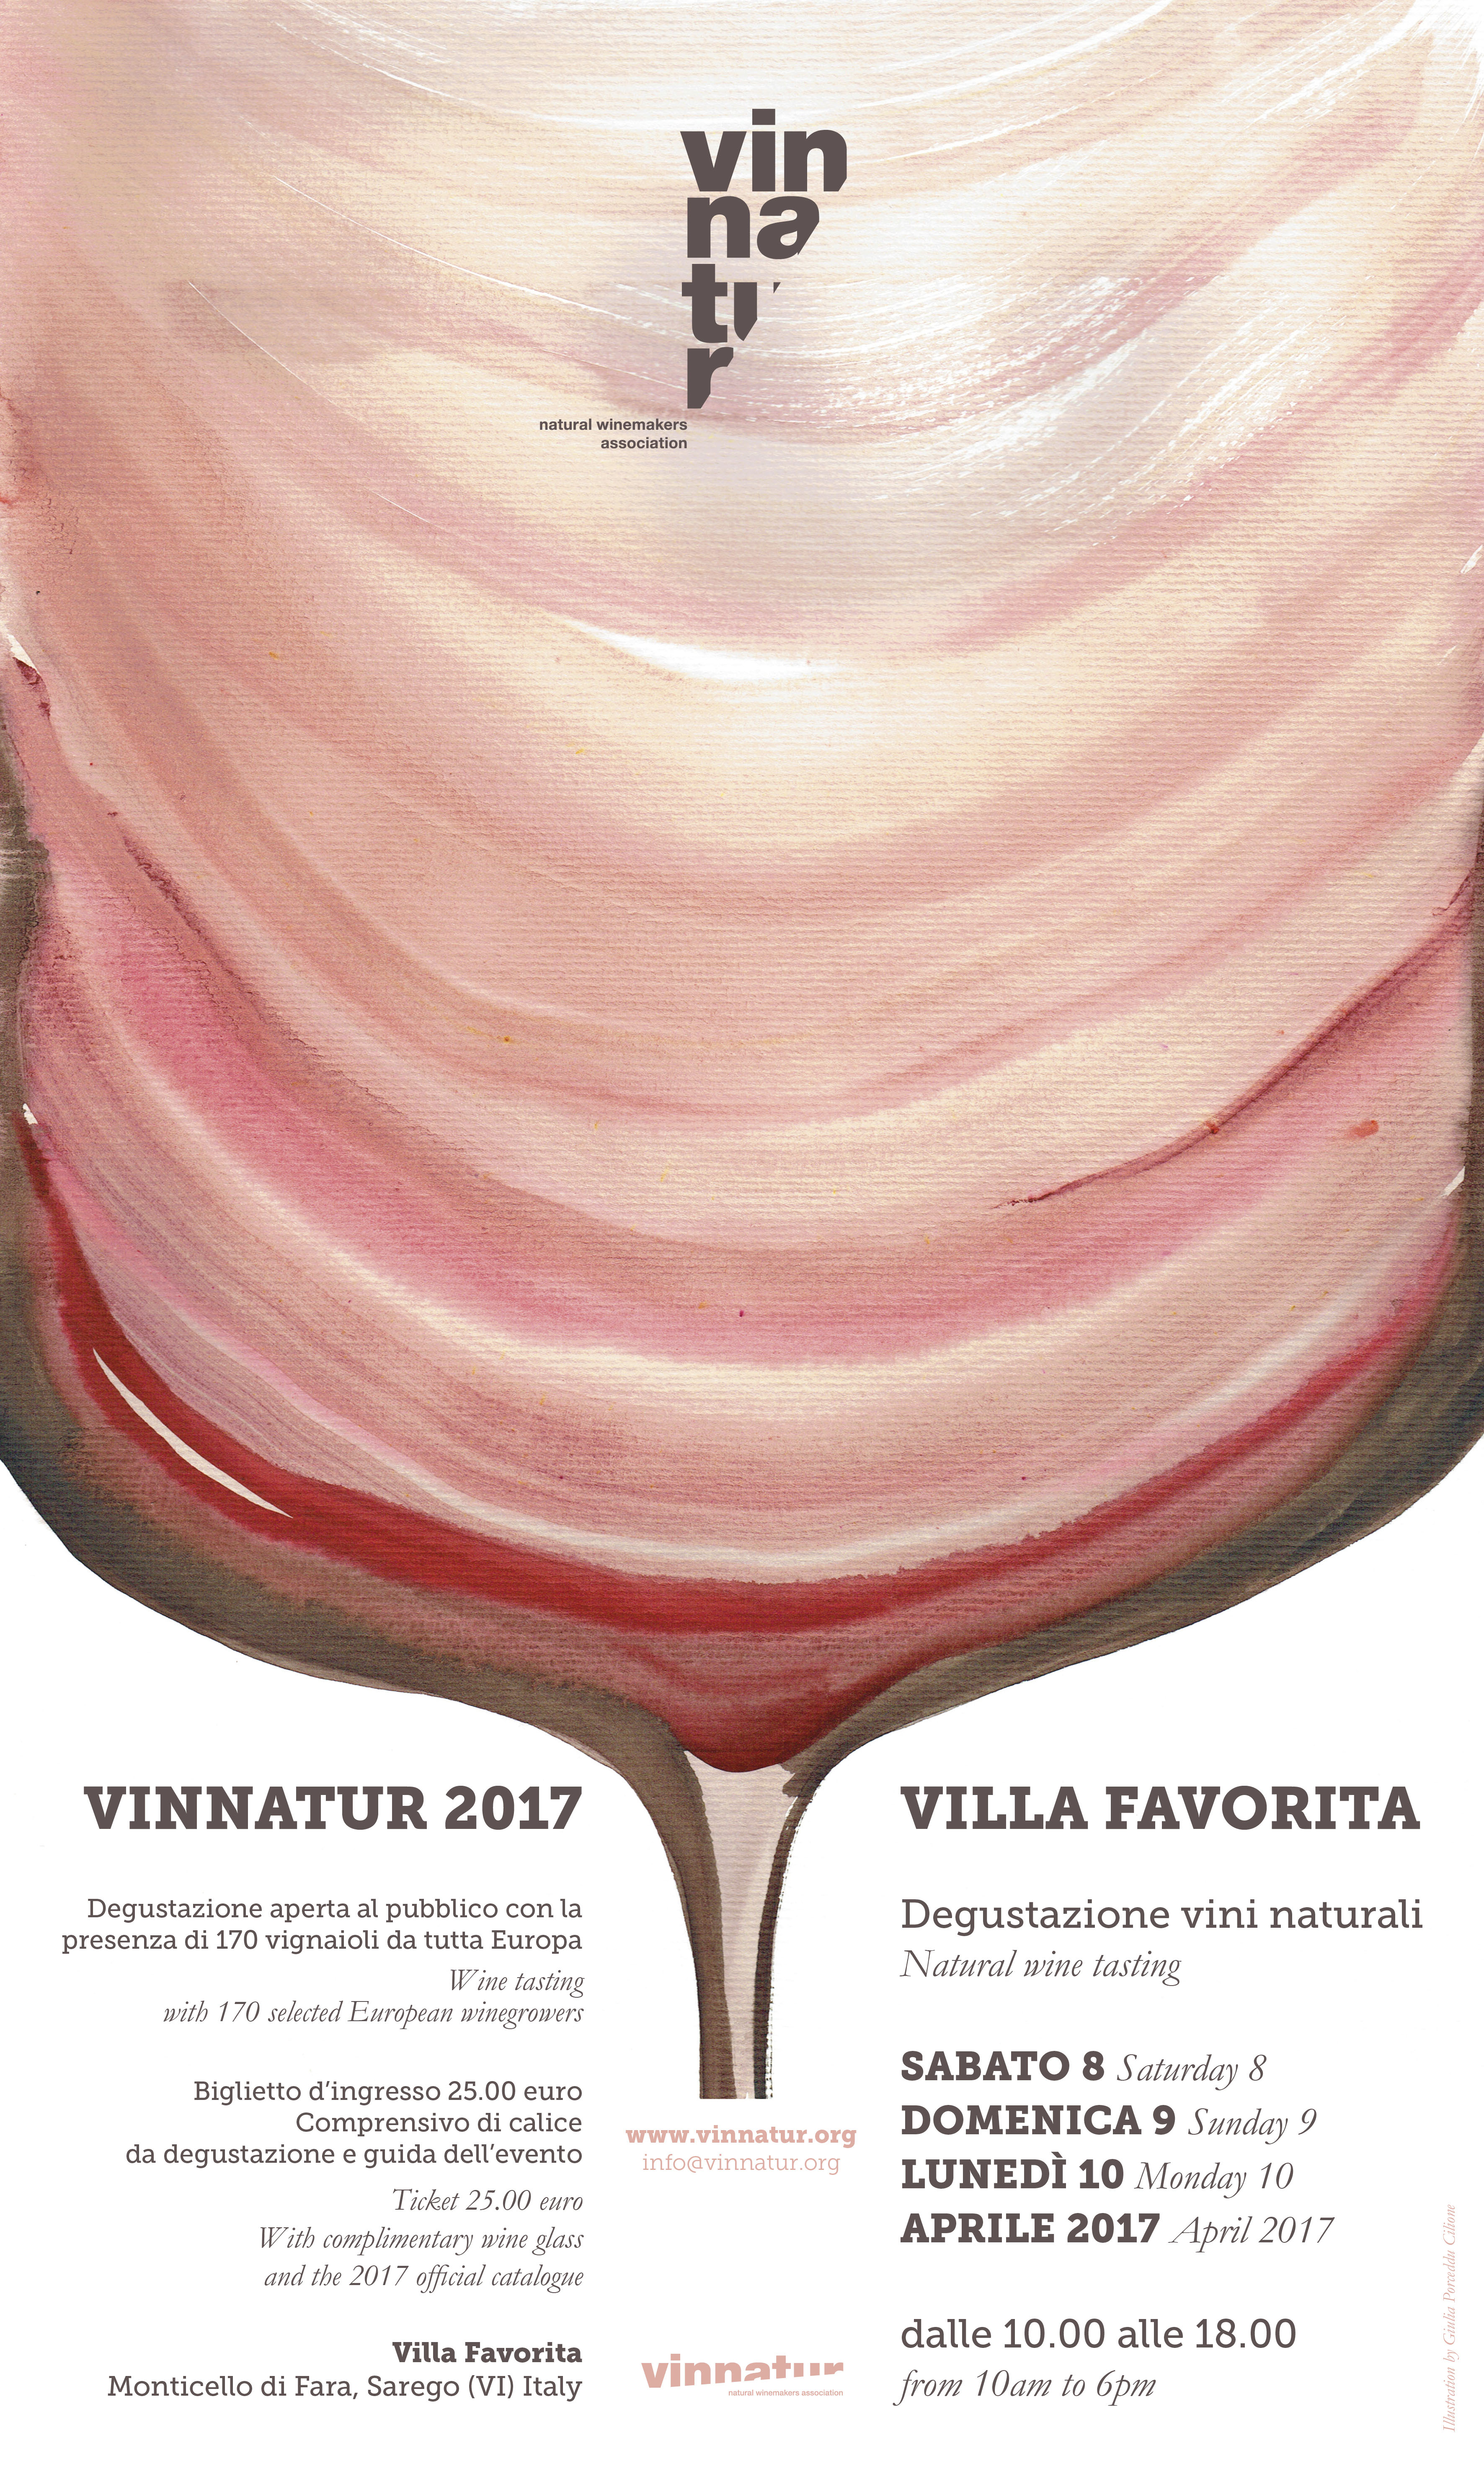 http://www.vinnatur.org/wp-content/uploads/2016/10/locandina-vf-2017.jpg